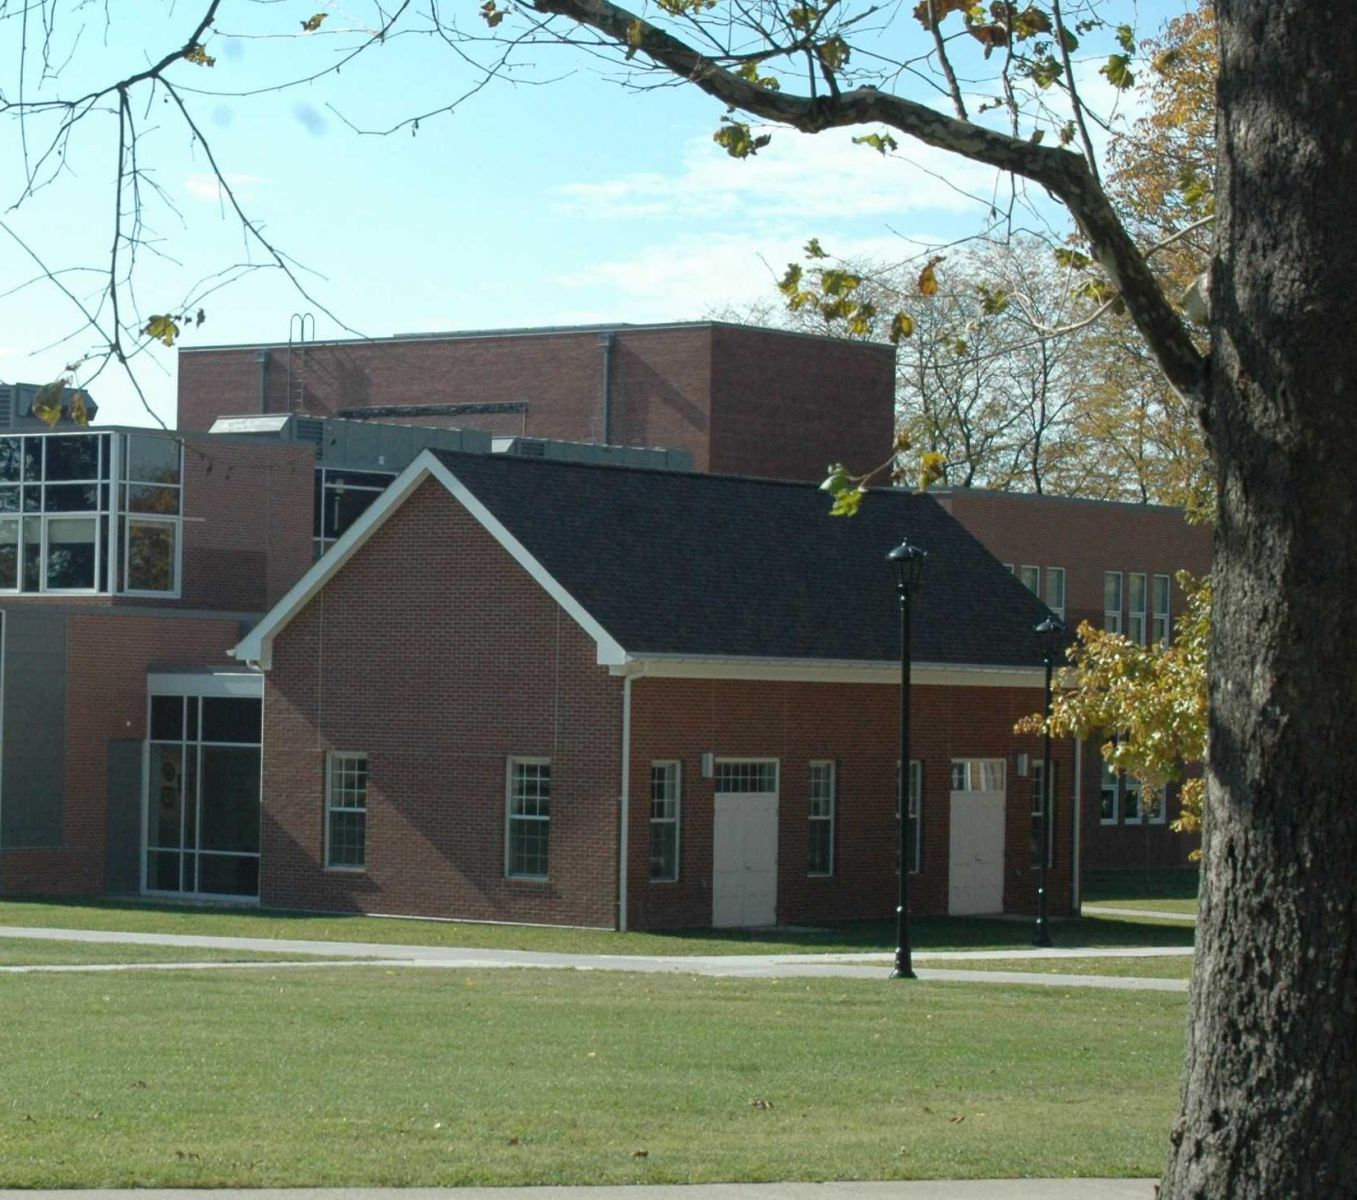 Quaker Heritage Study Center, Willmington College, Ohio